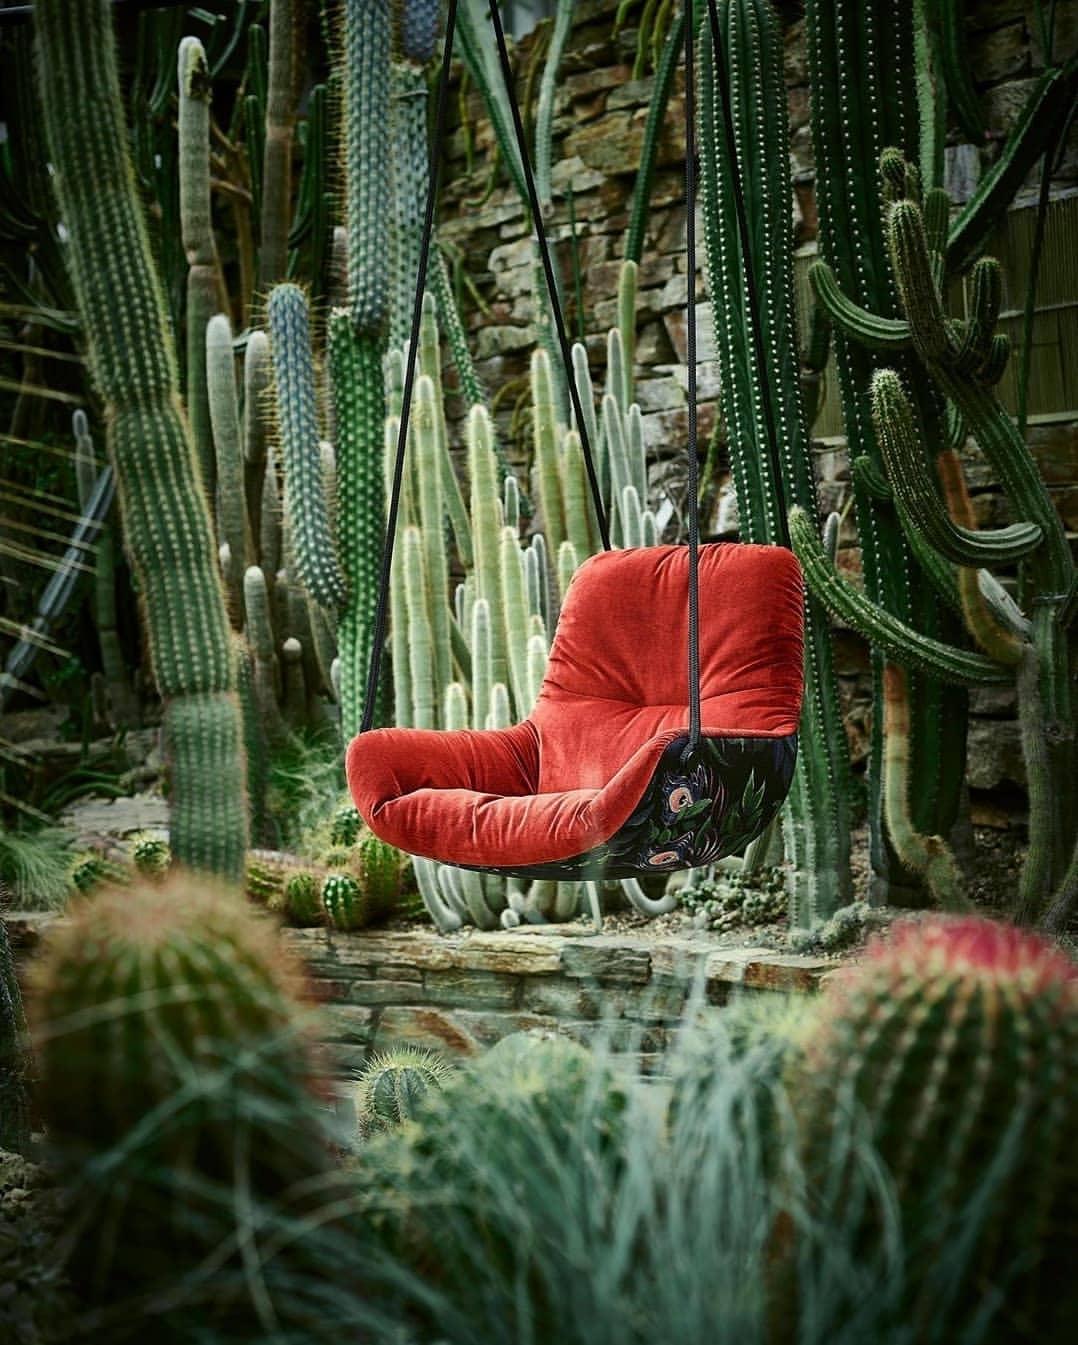 red-swing-seat-urban-jungle